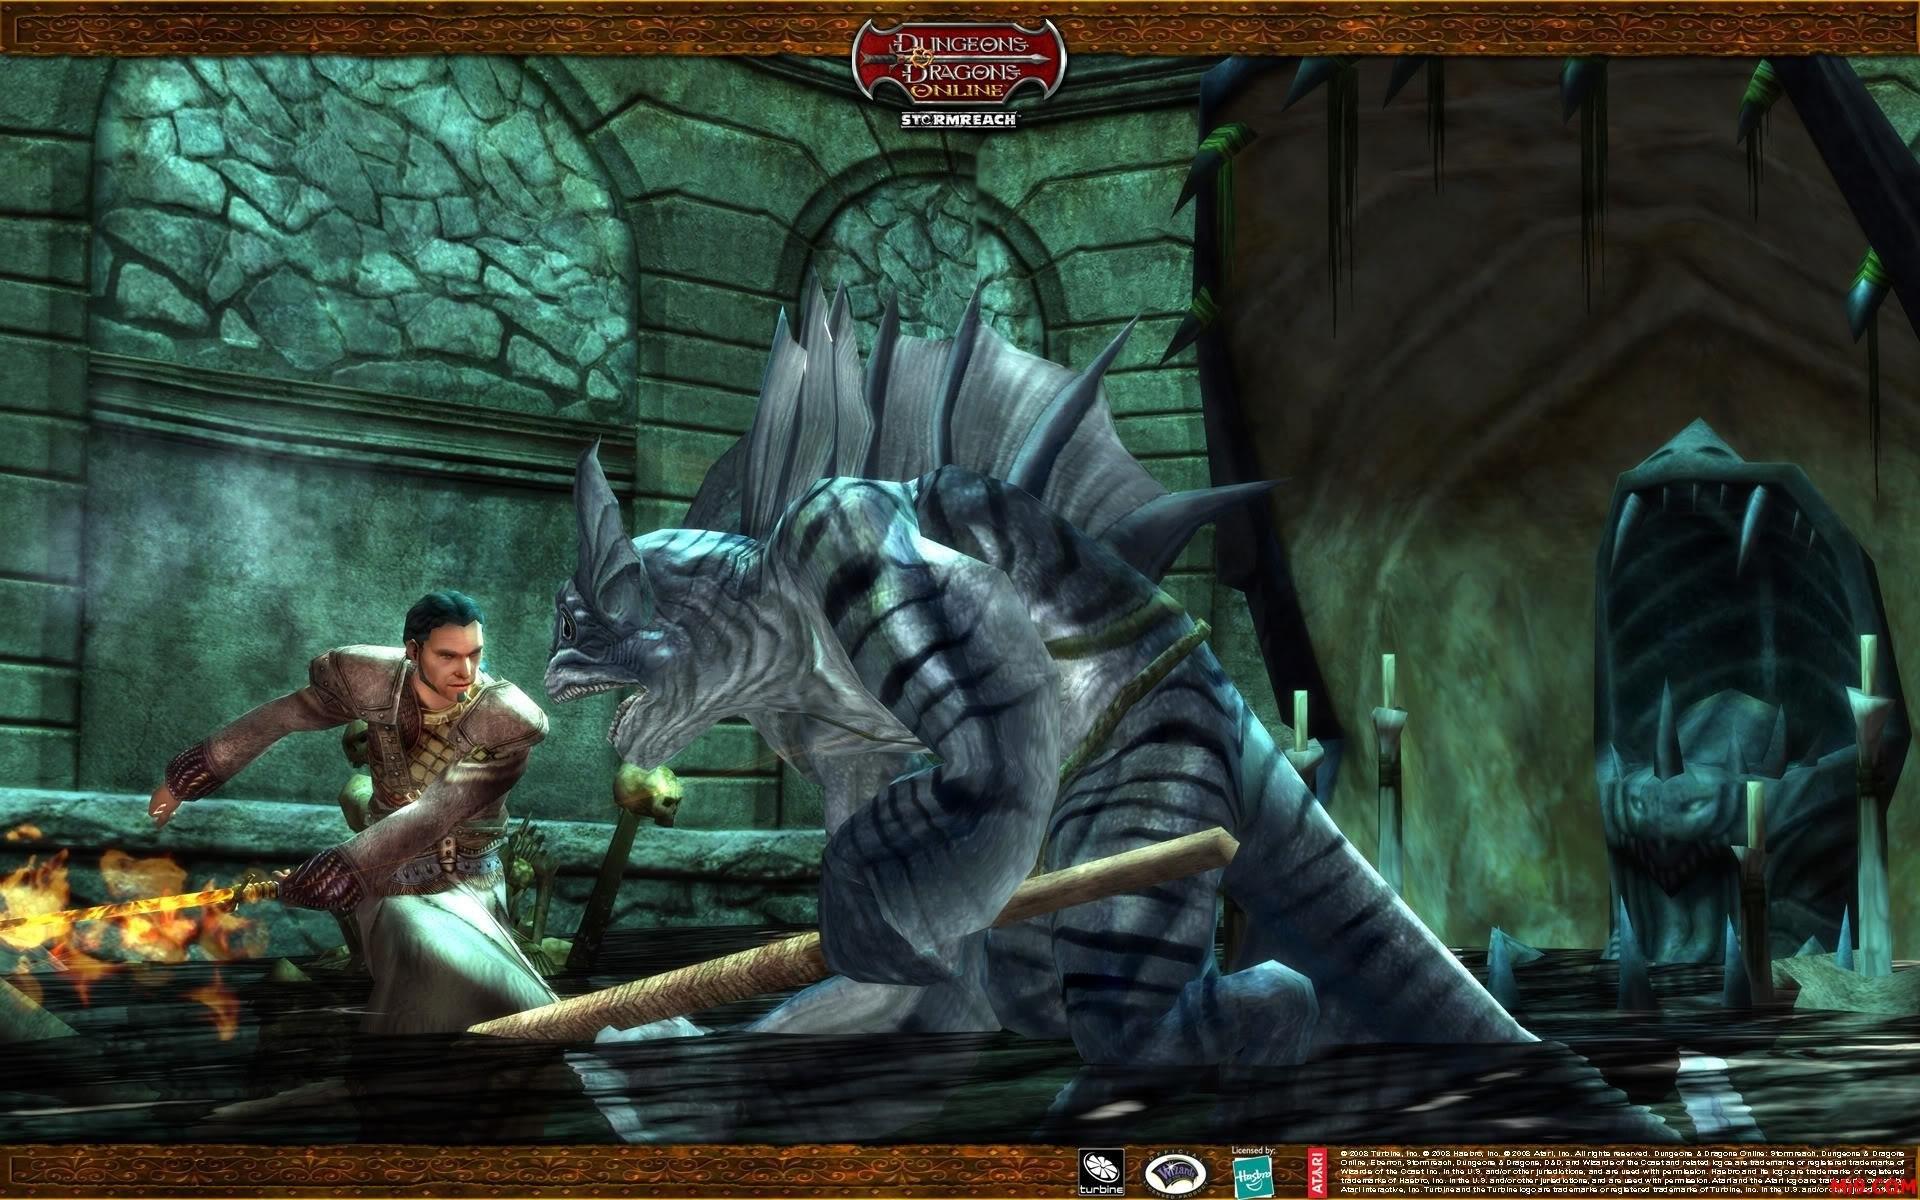 dungeons and dragons wallpaper 1920×1080 wallpapersafari; articles dungeons  dragons; dungeons and dragons online 686037 walldevil …